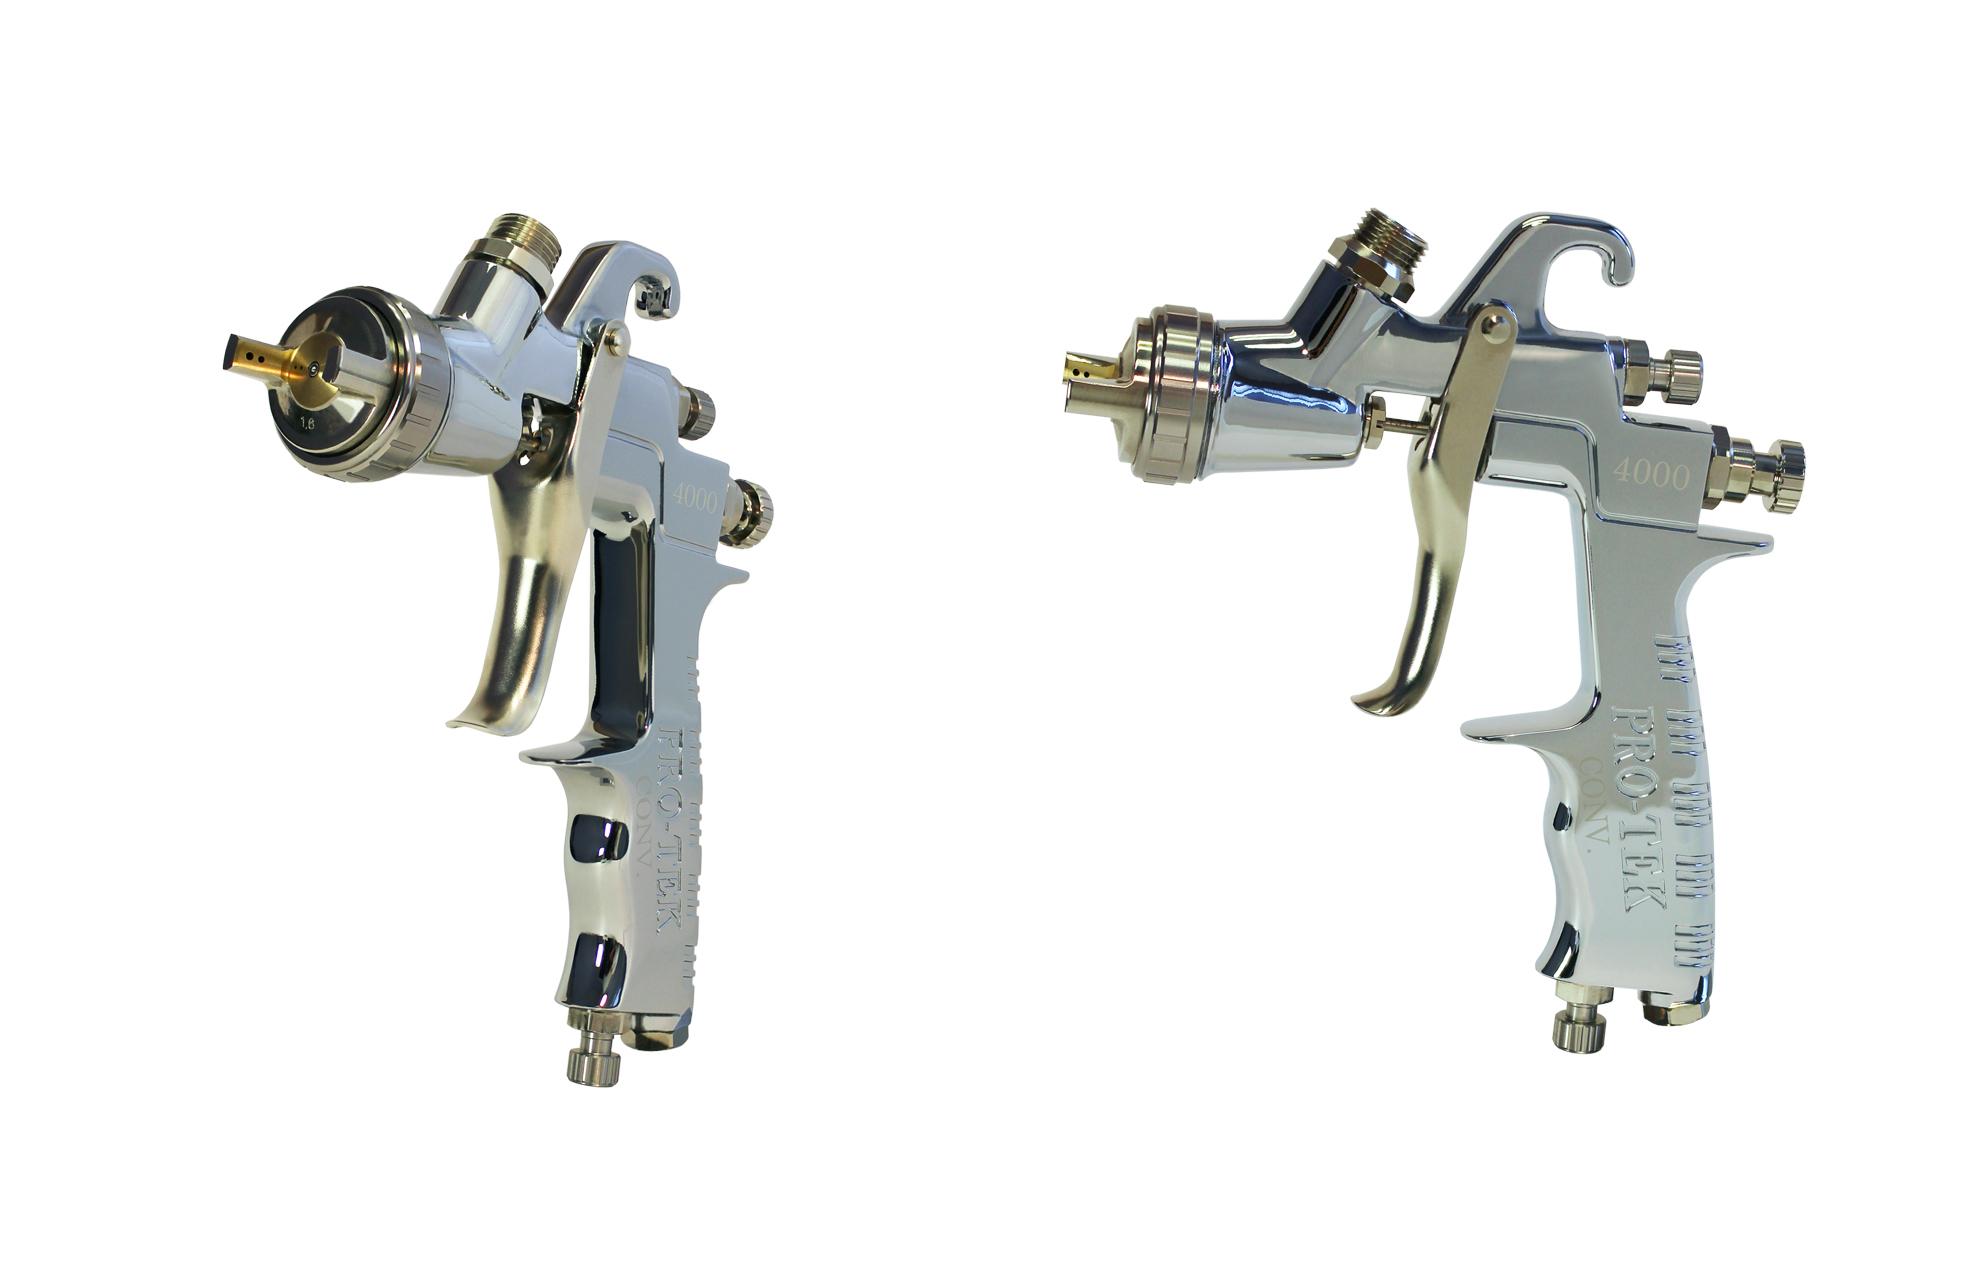 Pro Tek 4000g Gravity Spray Gun